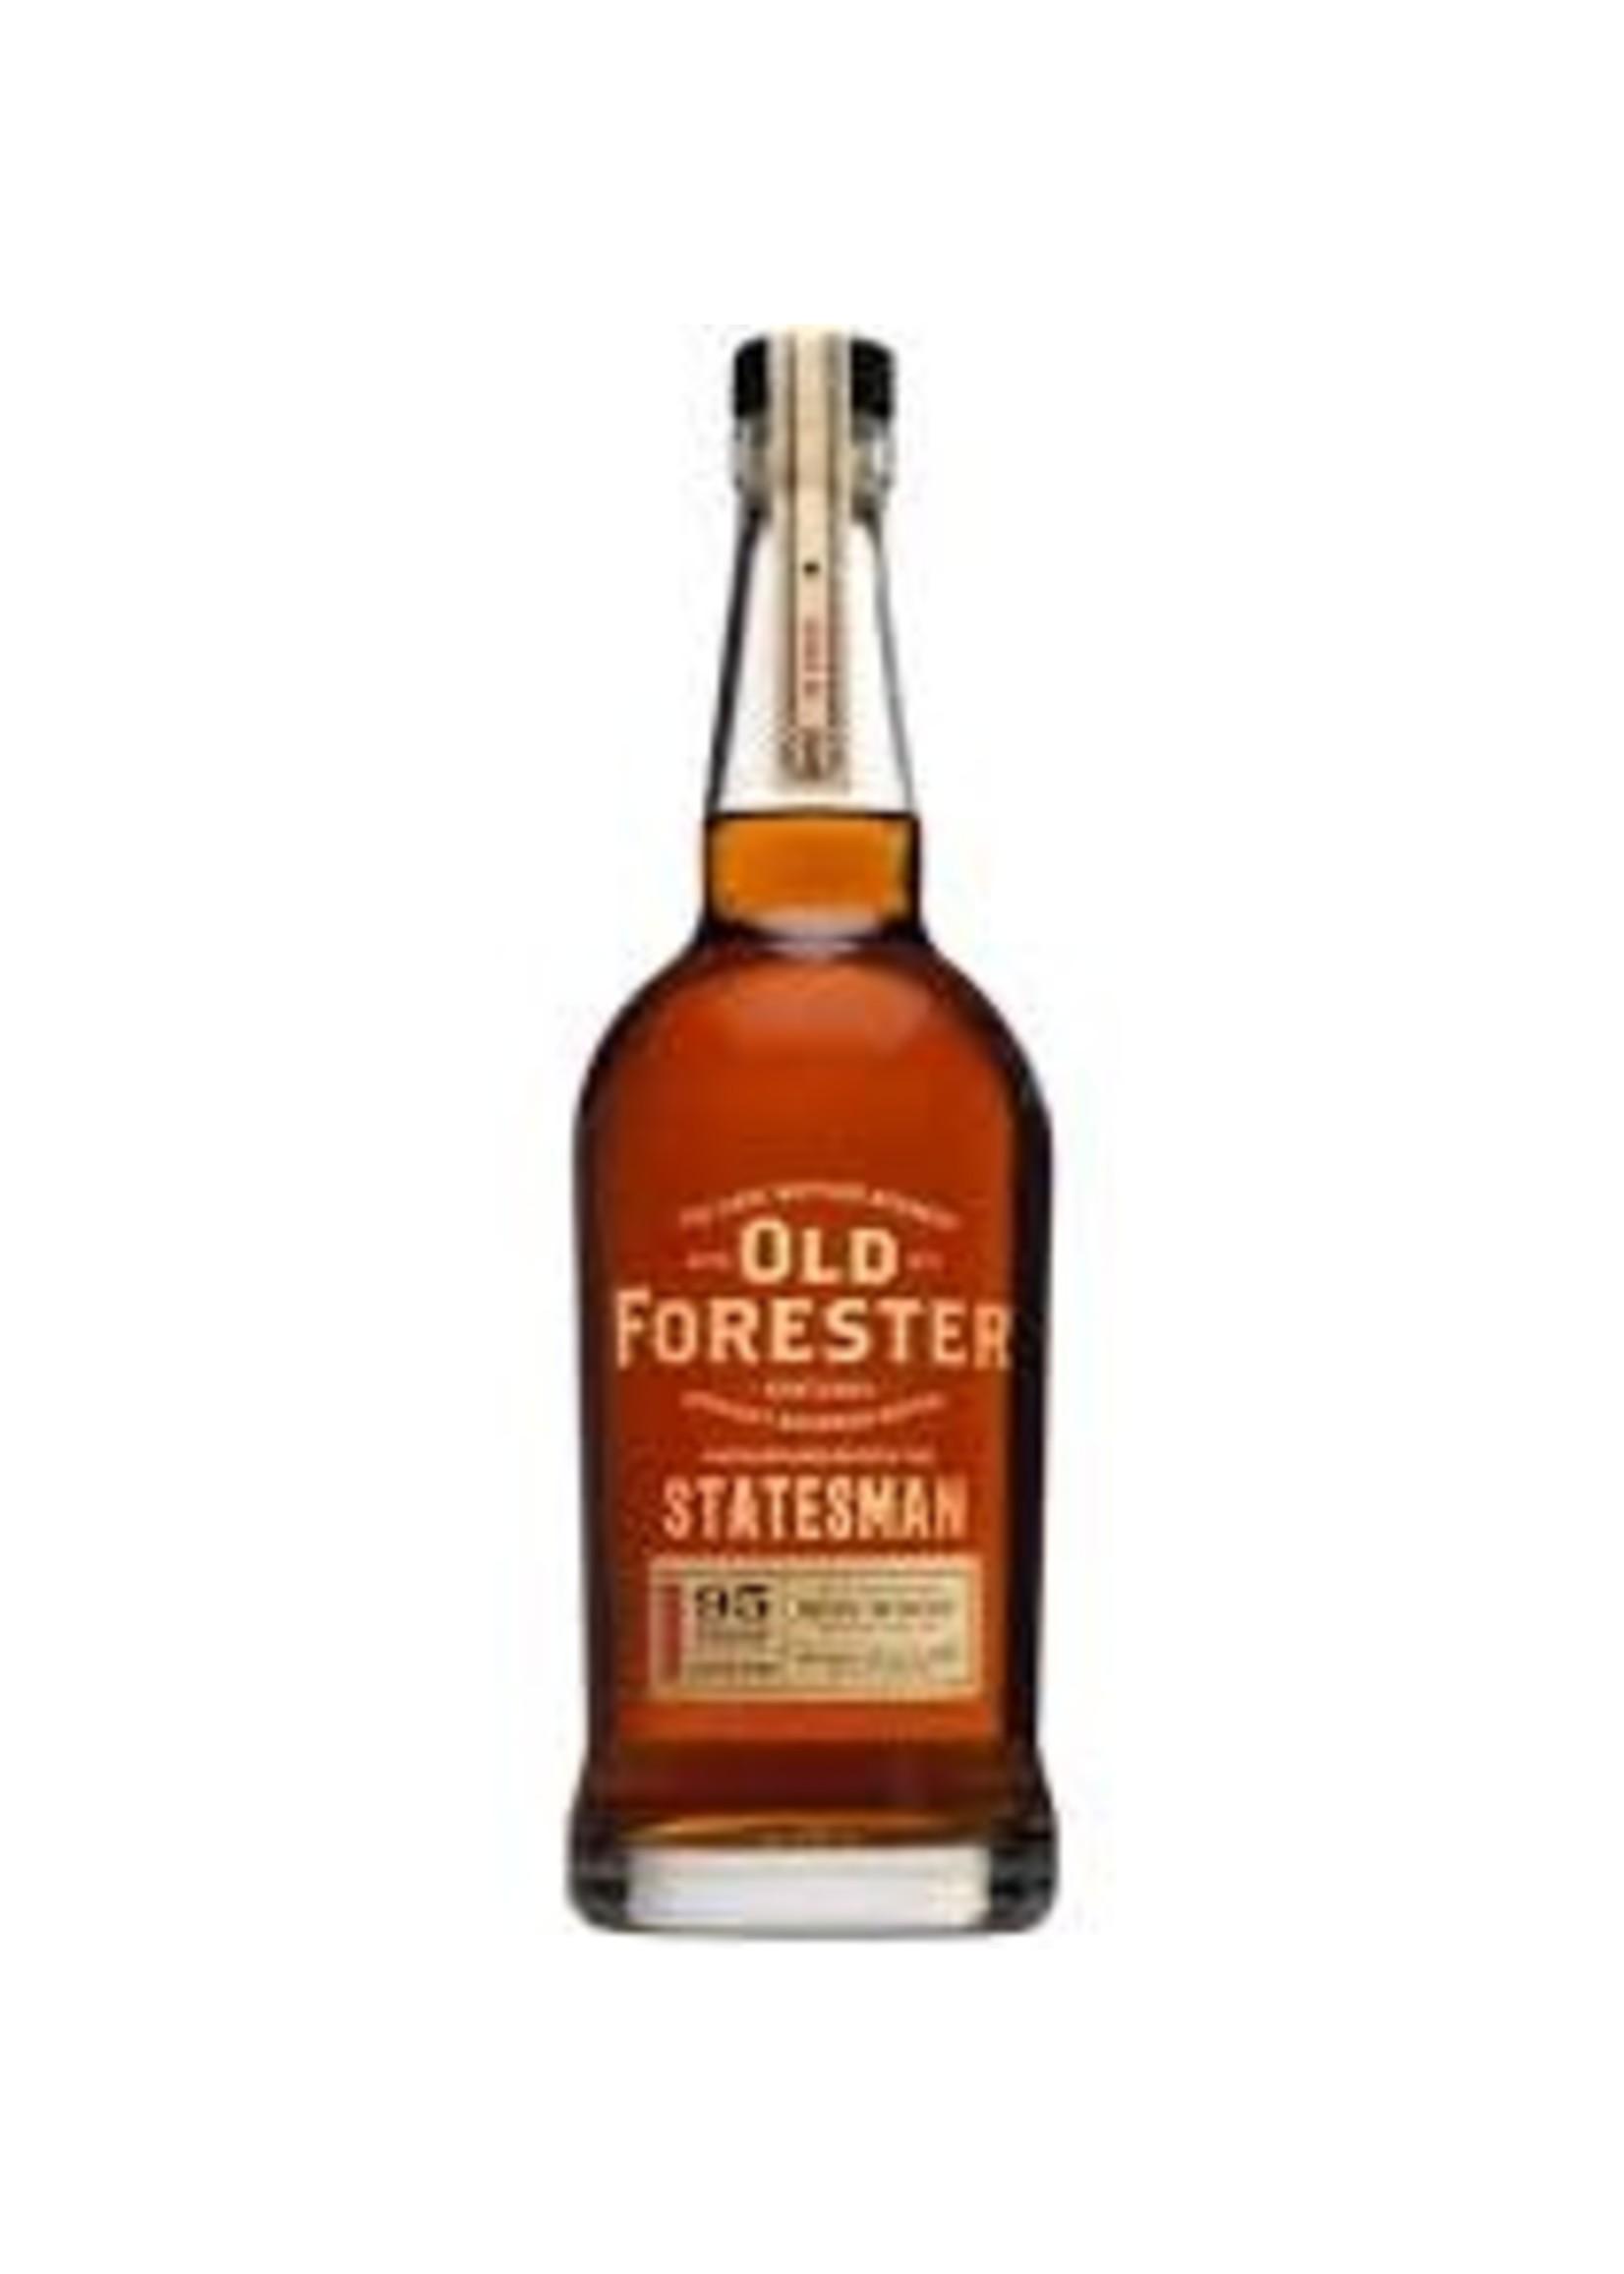 Old Forester Bourbon Statesman 95PF 750ml